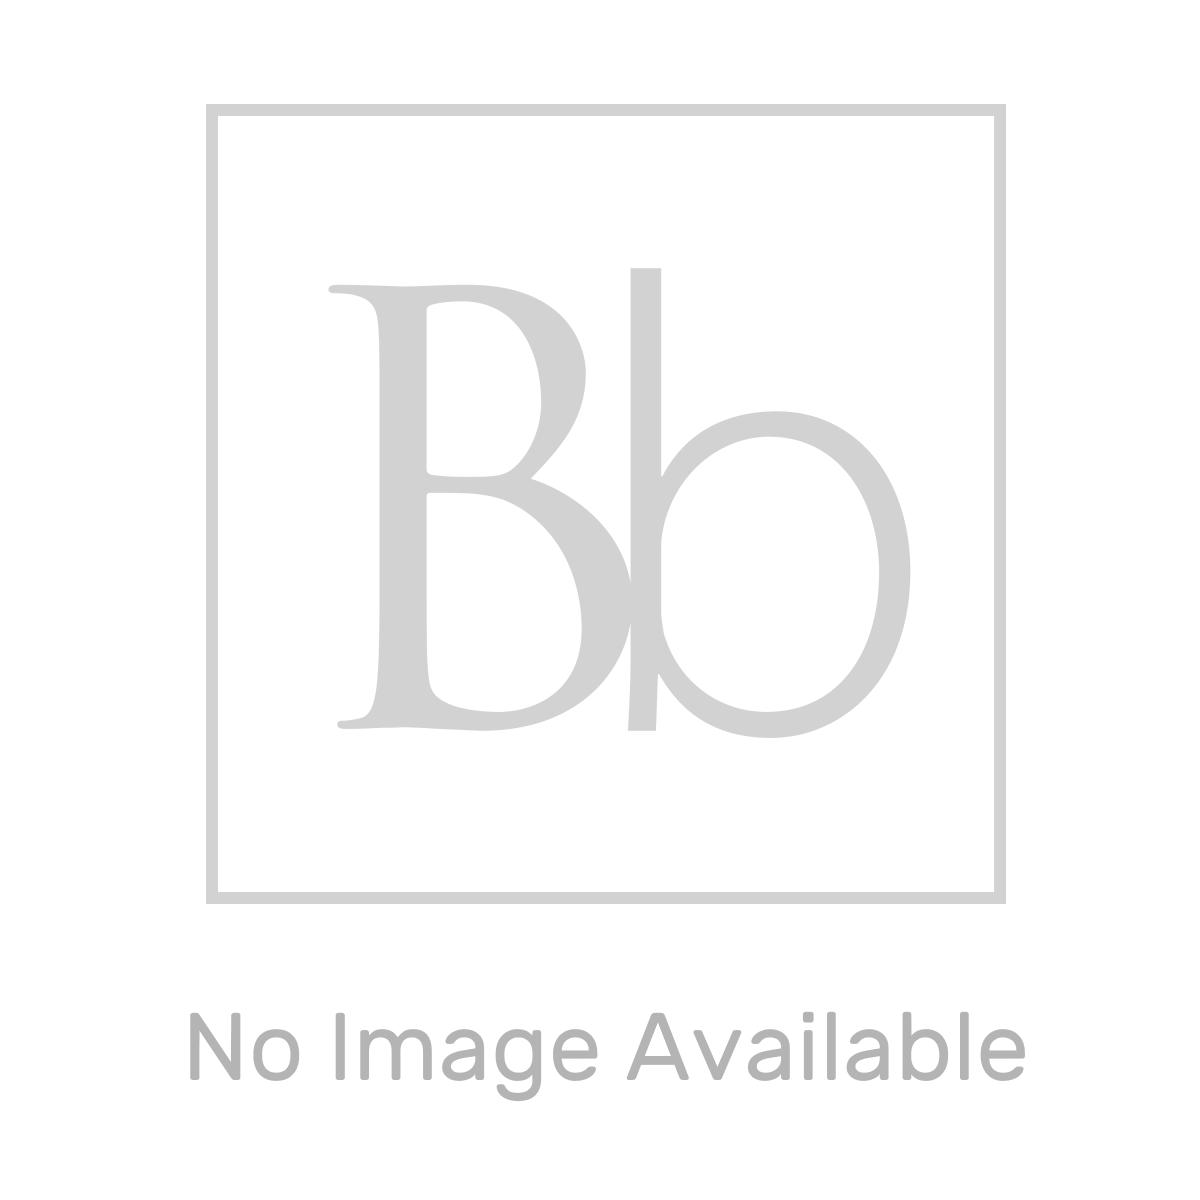 RAK Washington Wall Hung Toilet Measurements